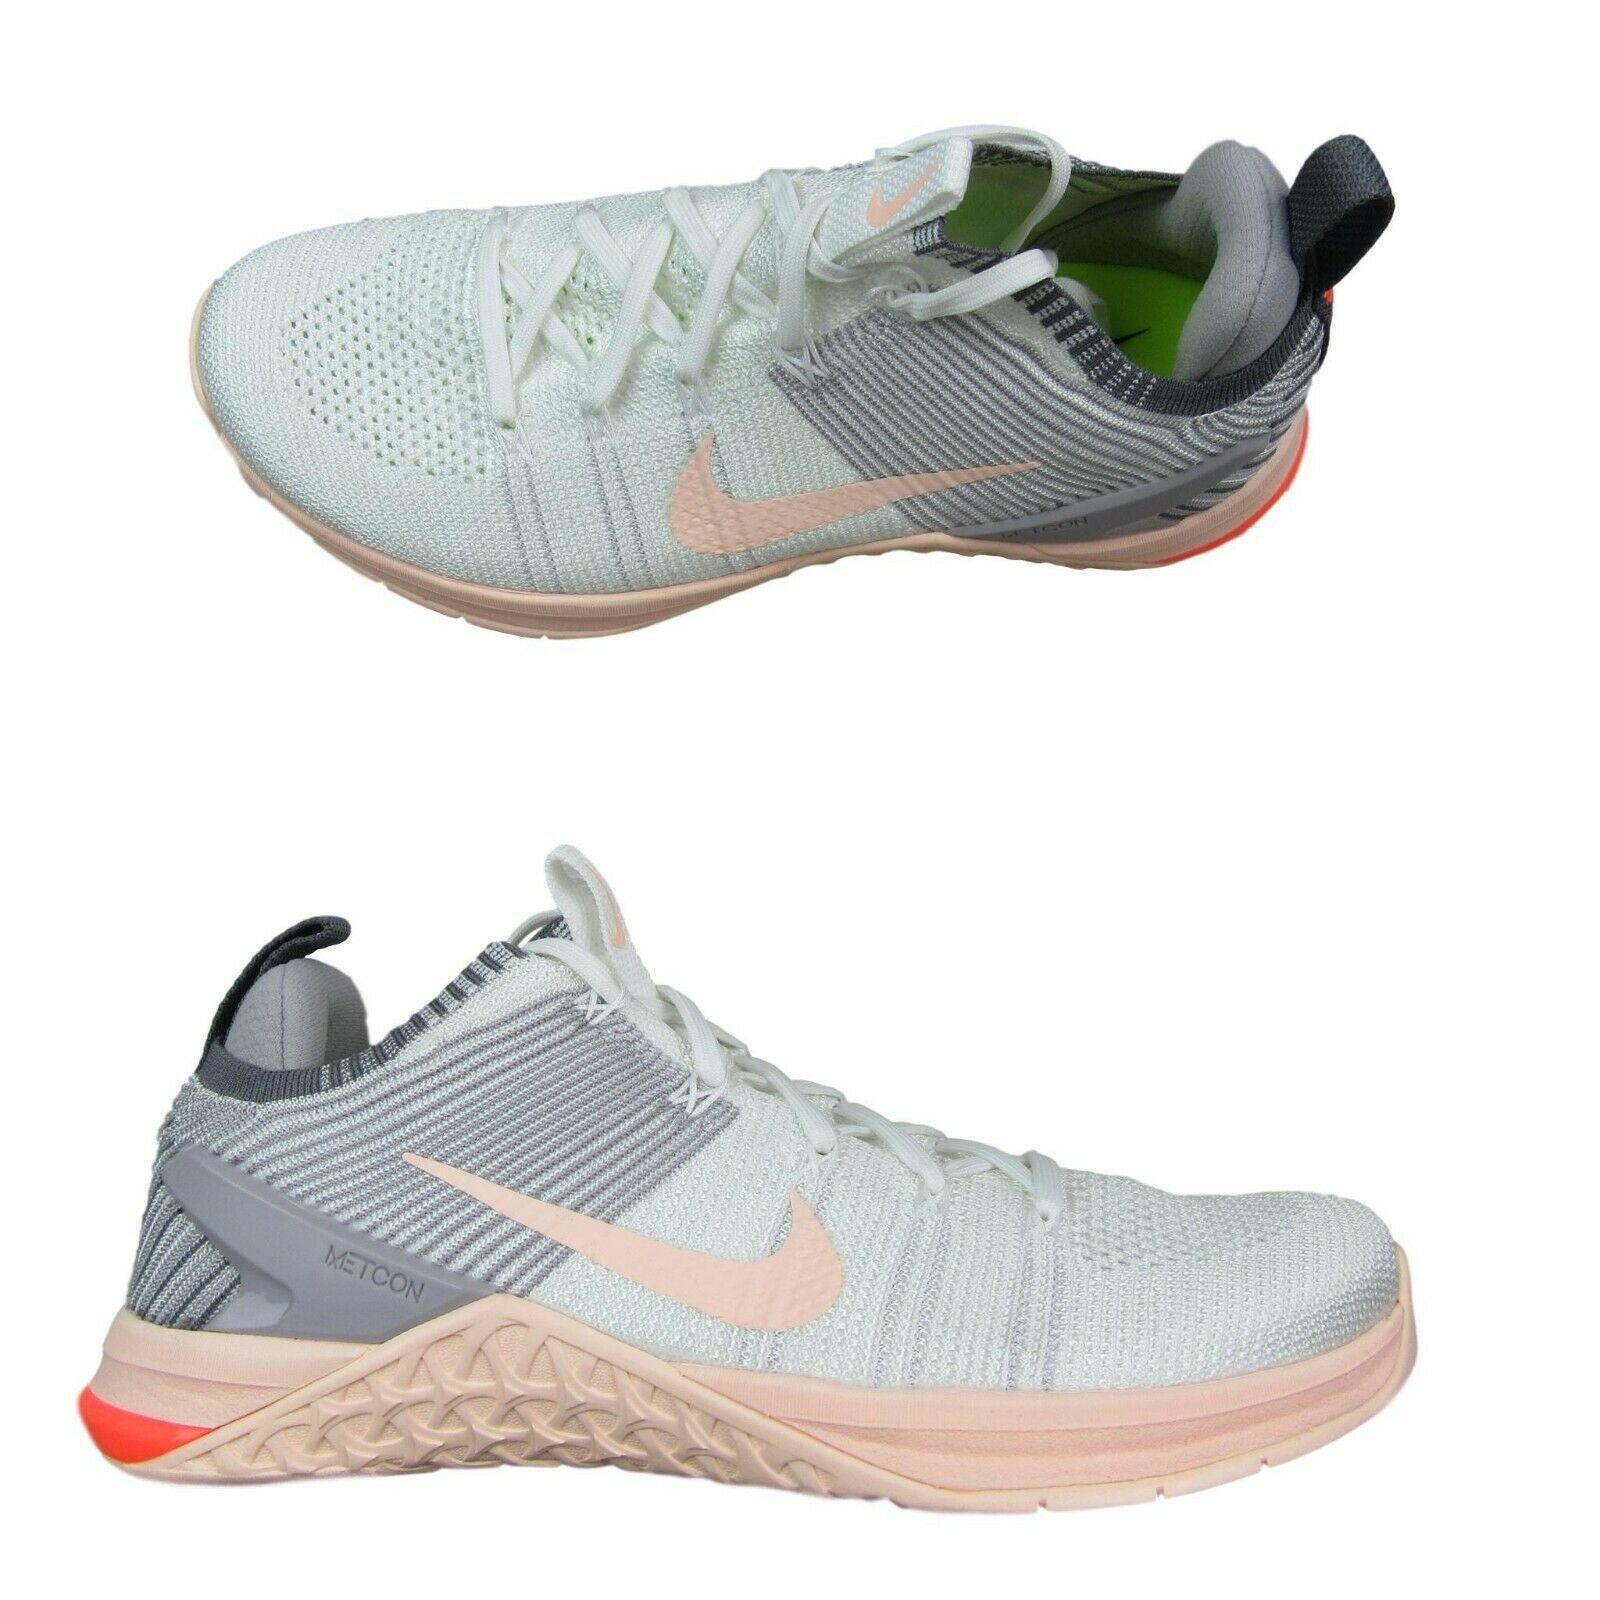 sports shoes 3a2e6 b7343 Nike Metcon DSX Flyknit 2 Womens Cross Training Gym Shoes Size 10 ...